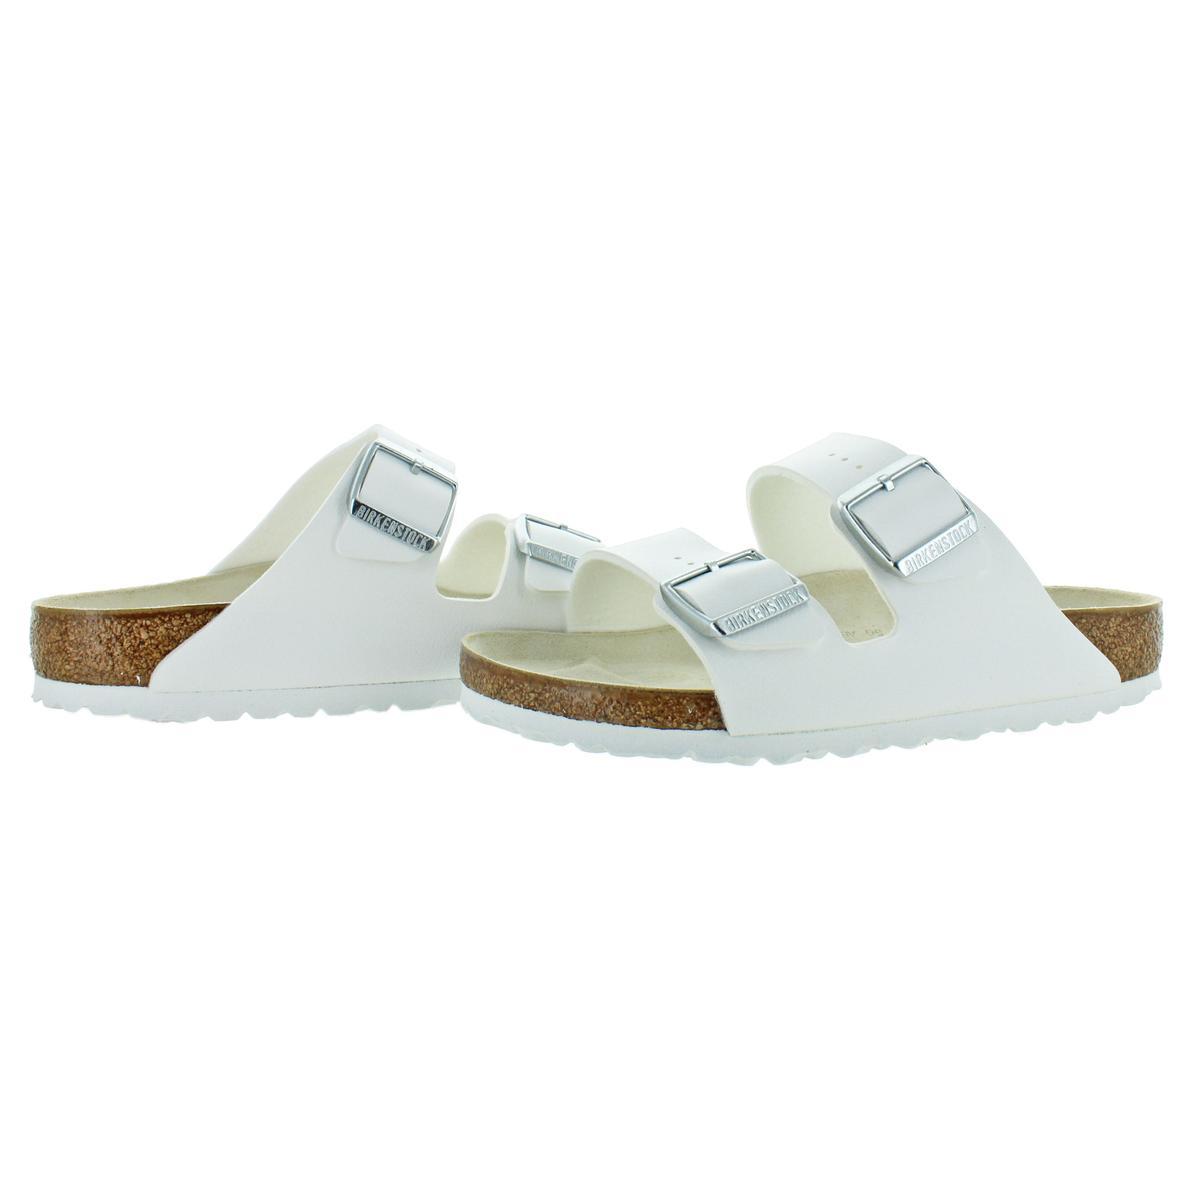 Birkenstock-Women-039-s-Arizona-Double-Buckle-Cork-Sandals thumbnail 7